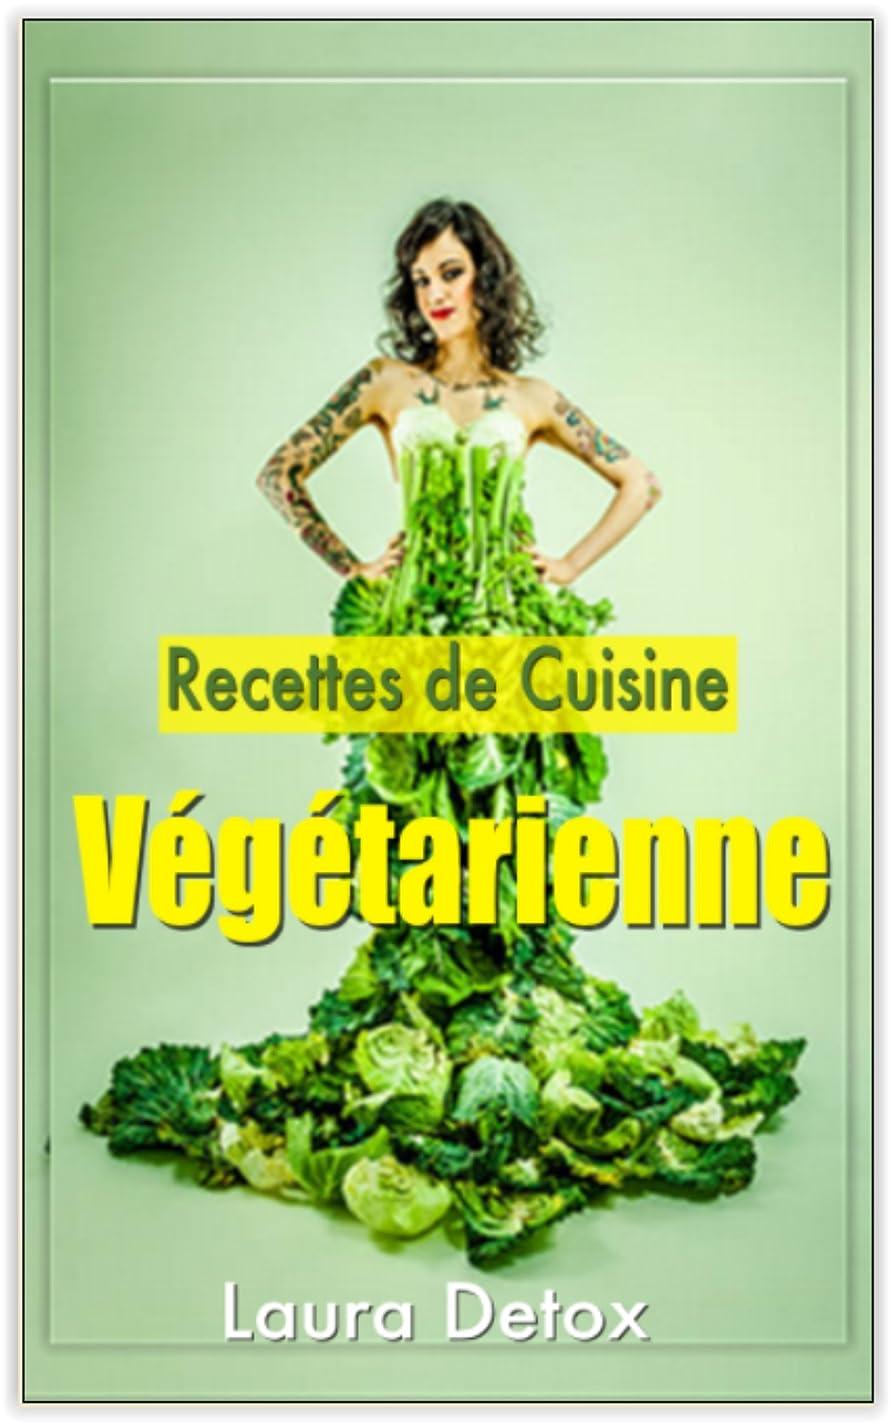 スープ武器母Recettes de Cuisine Végétarienne: Comment Composer Une Recette De Cuisine Vegan Pour Tous Les Jours ? (French Edition)